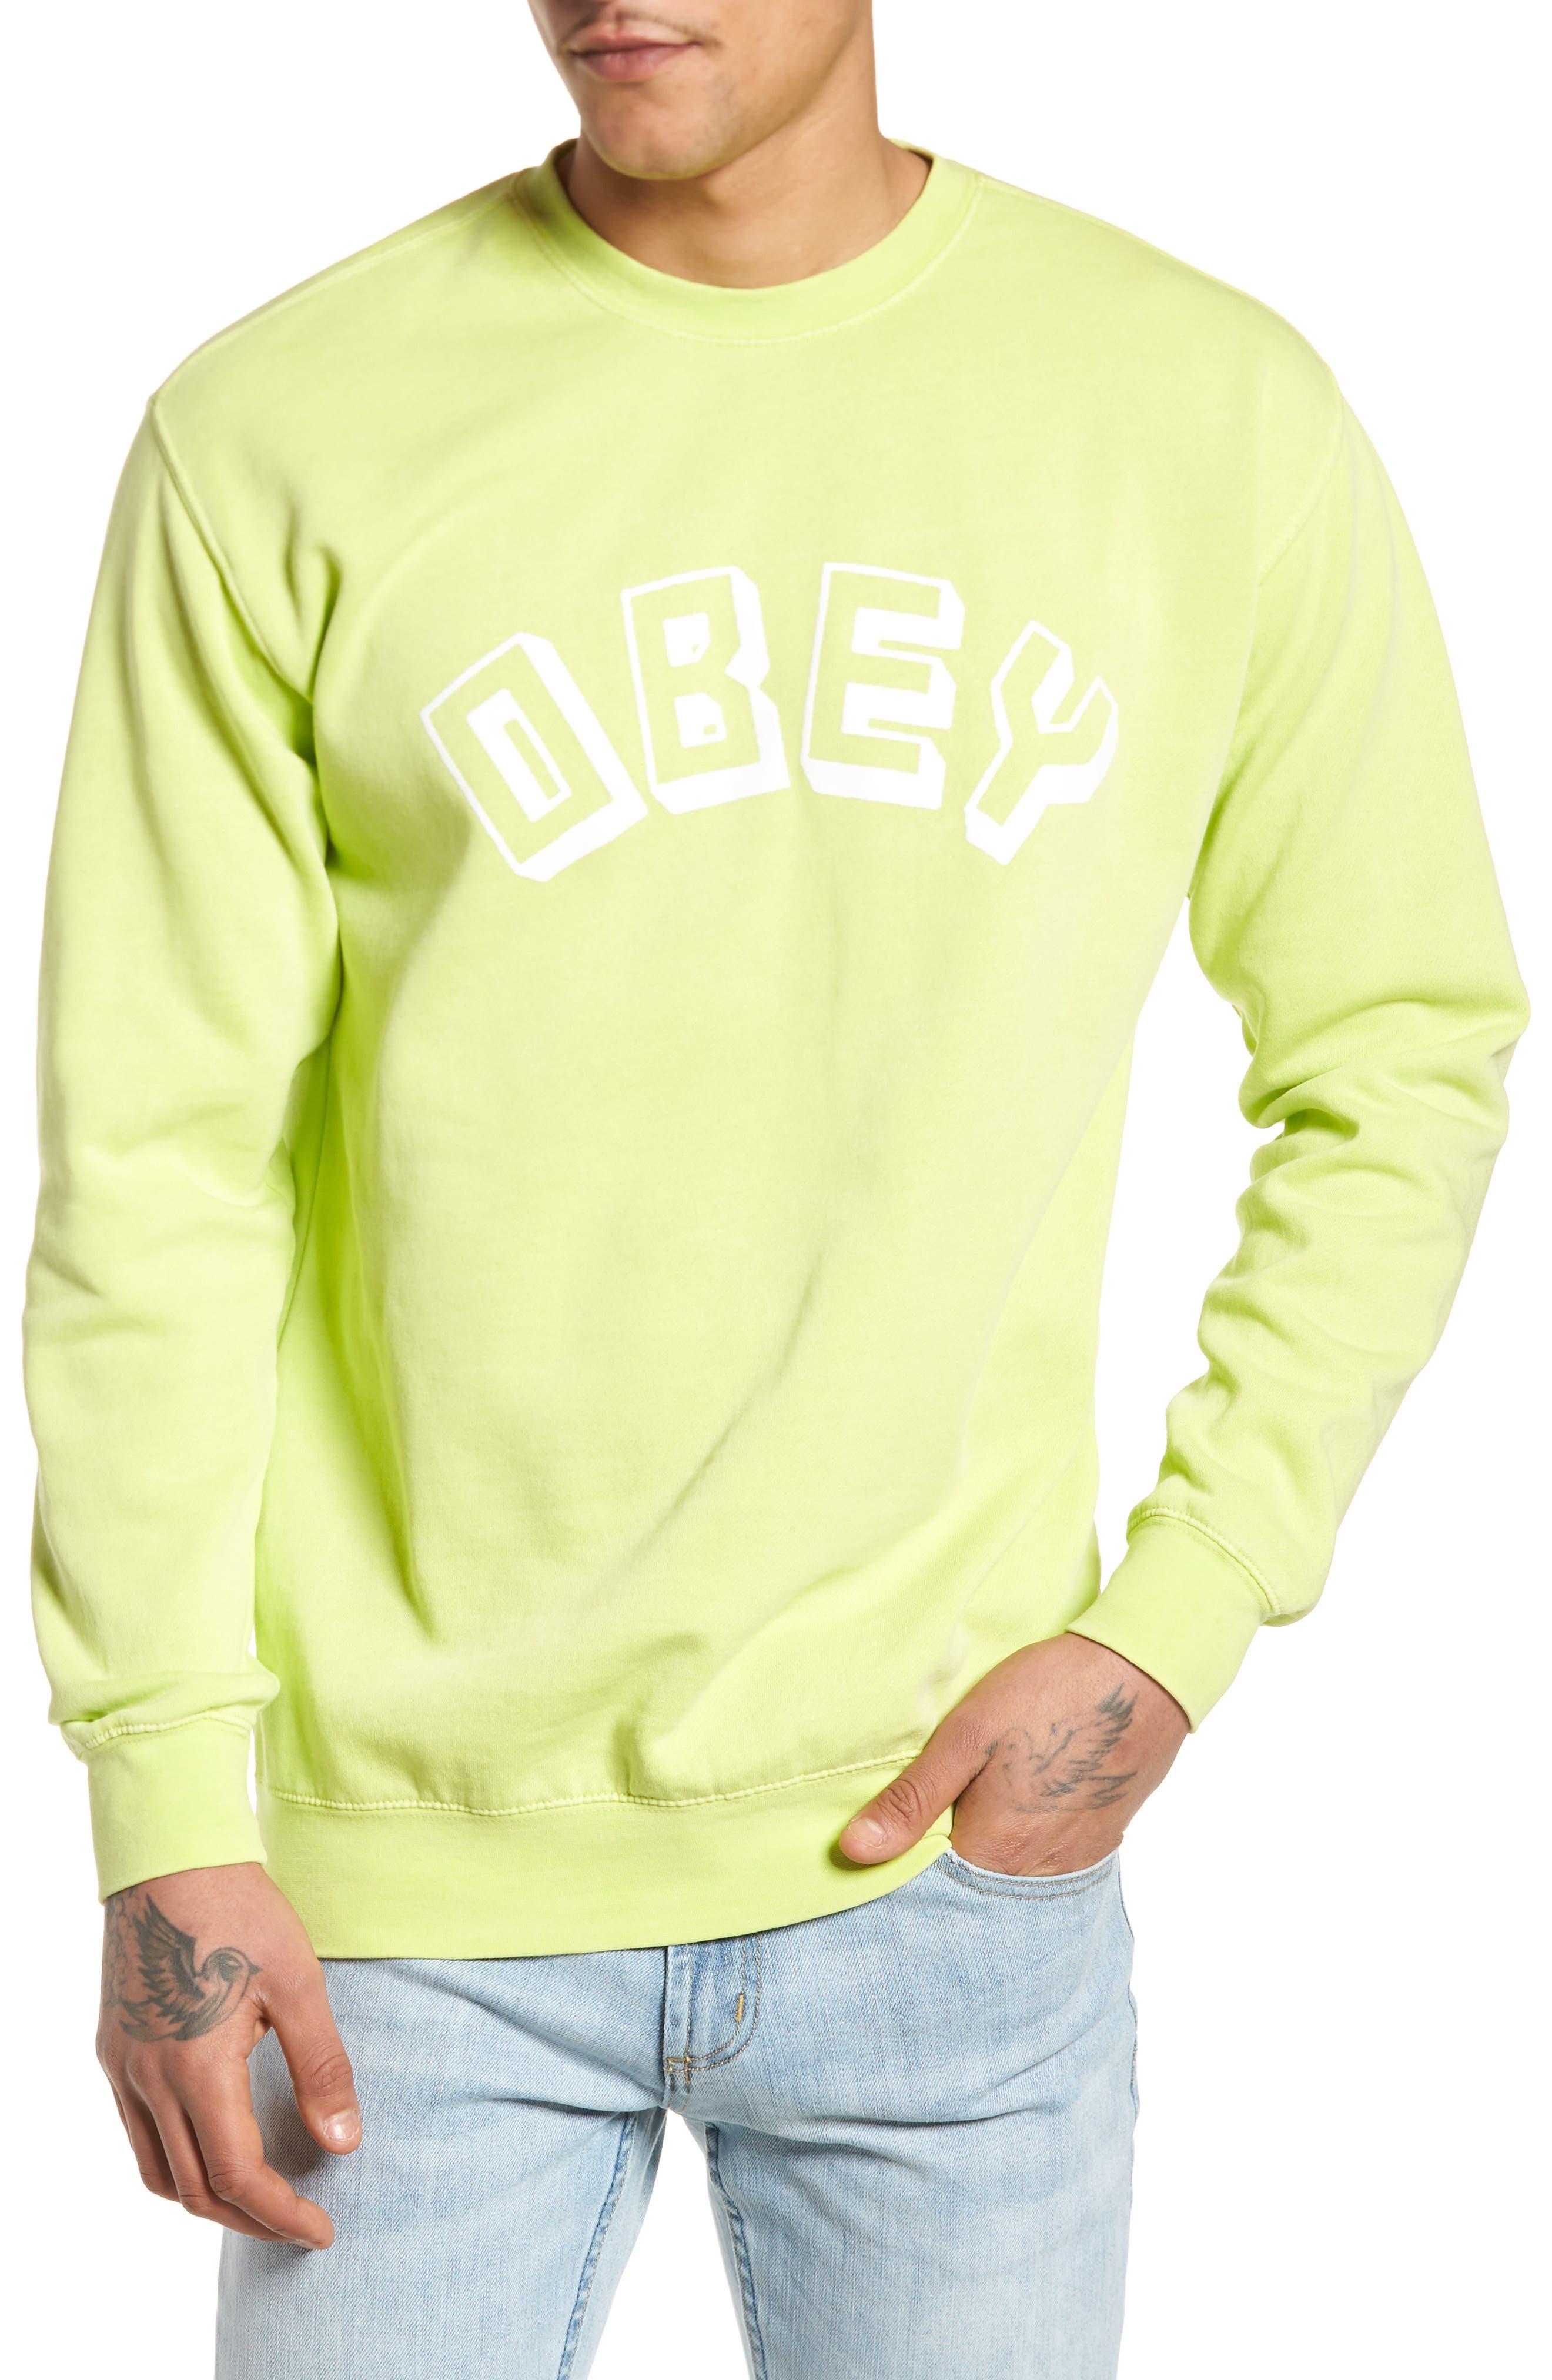 New World Sweatshirt,                             Main thumbnail 1, color,                             Dusty Mint